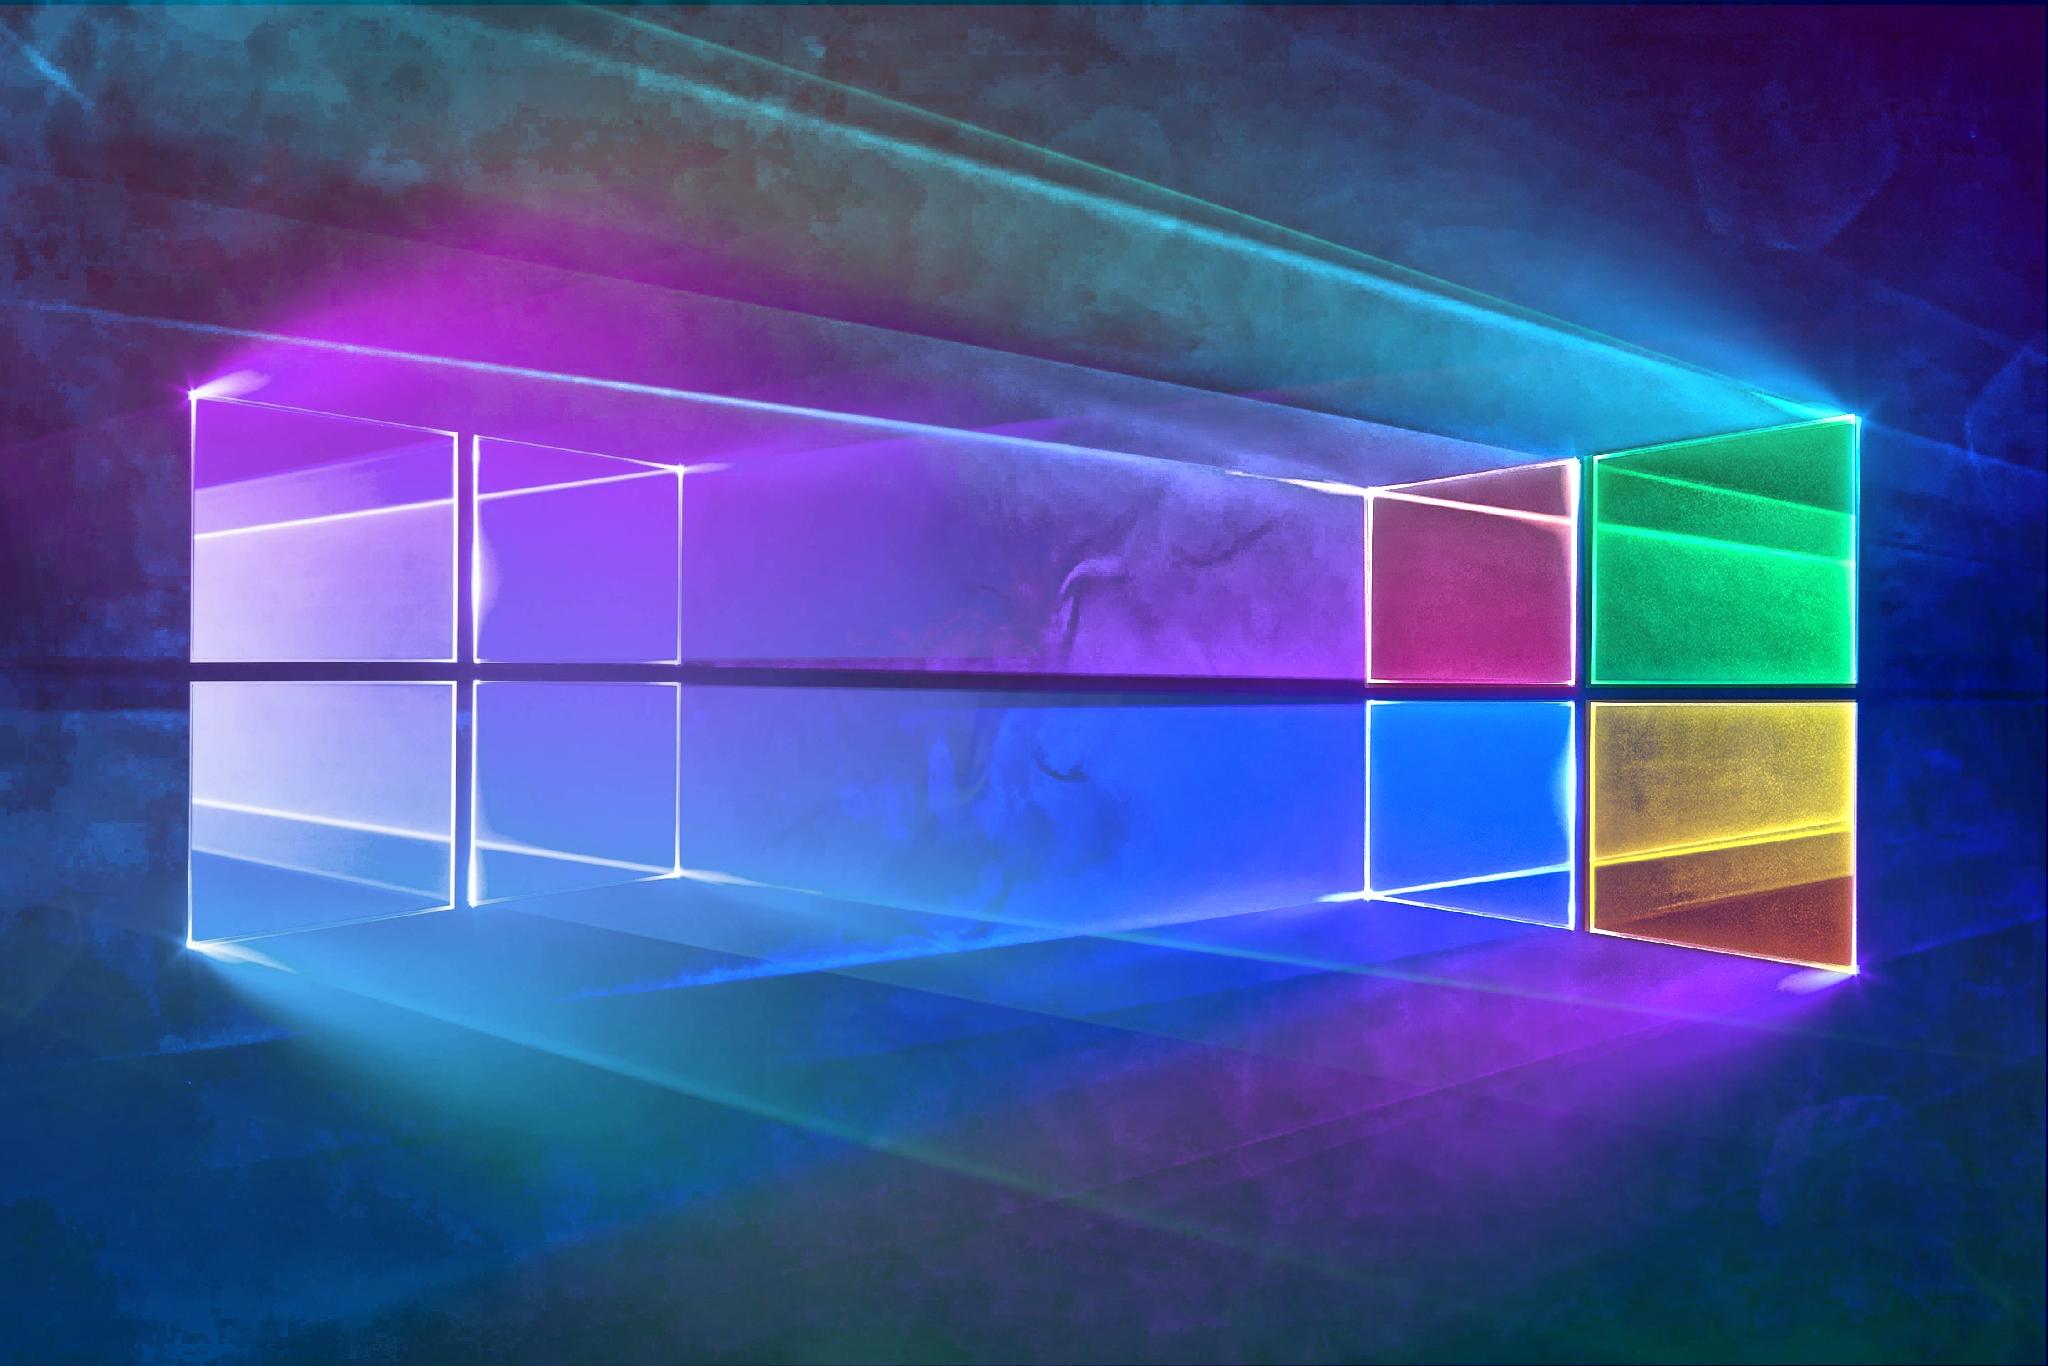 Windows 20 2560x1440 Wallpaper Windows 10 Cool Desktop Wallpapers Windows Wallpaper